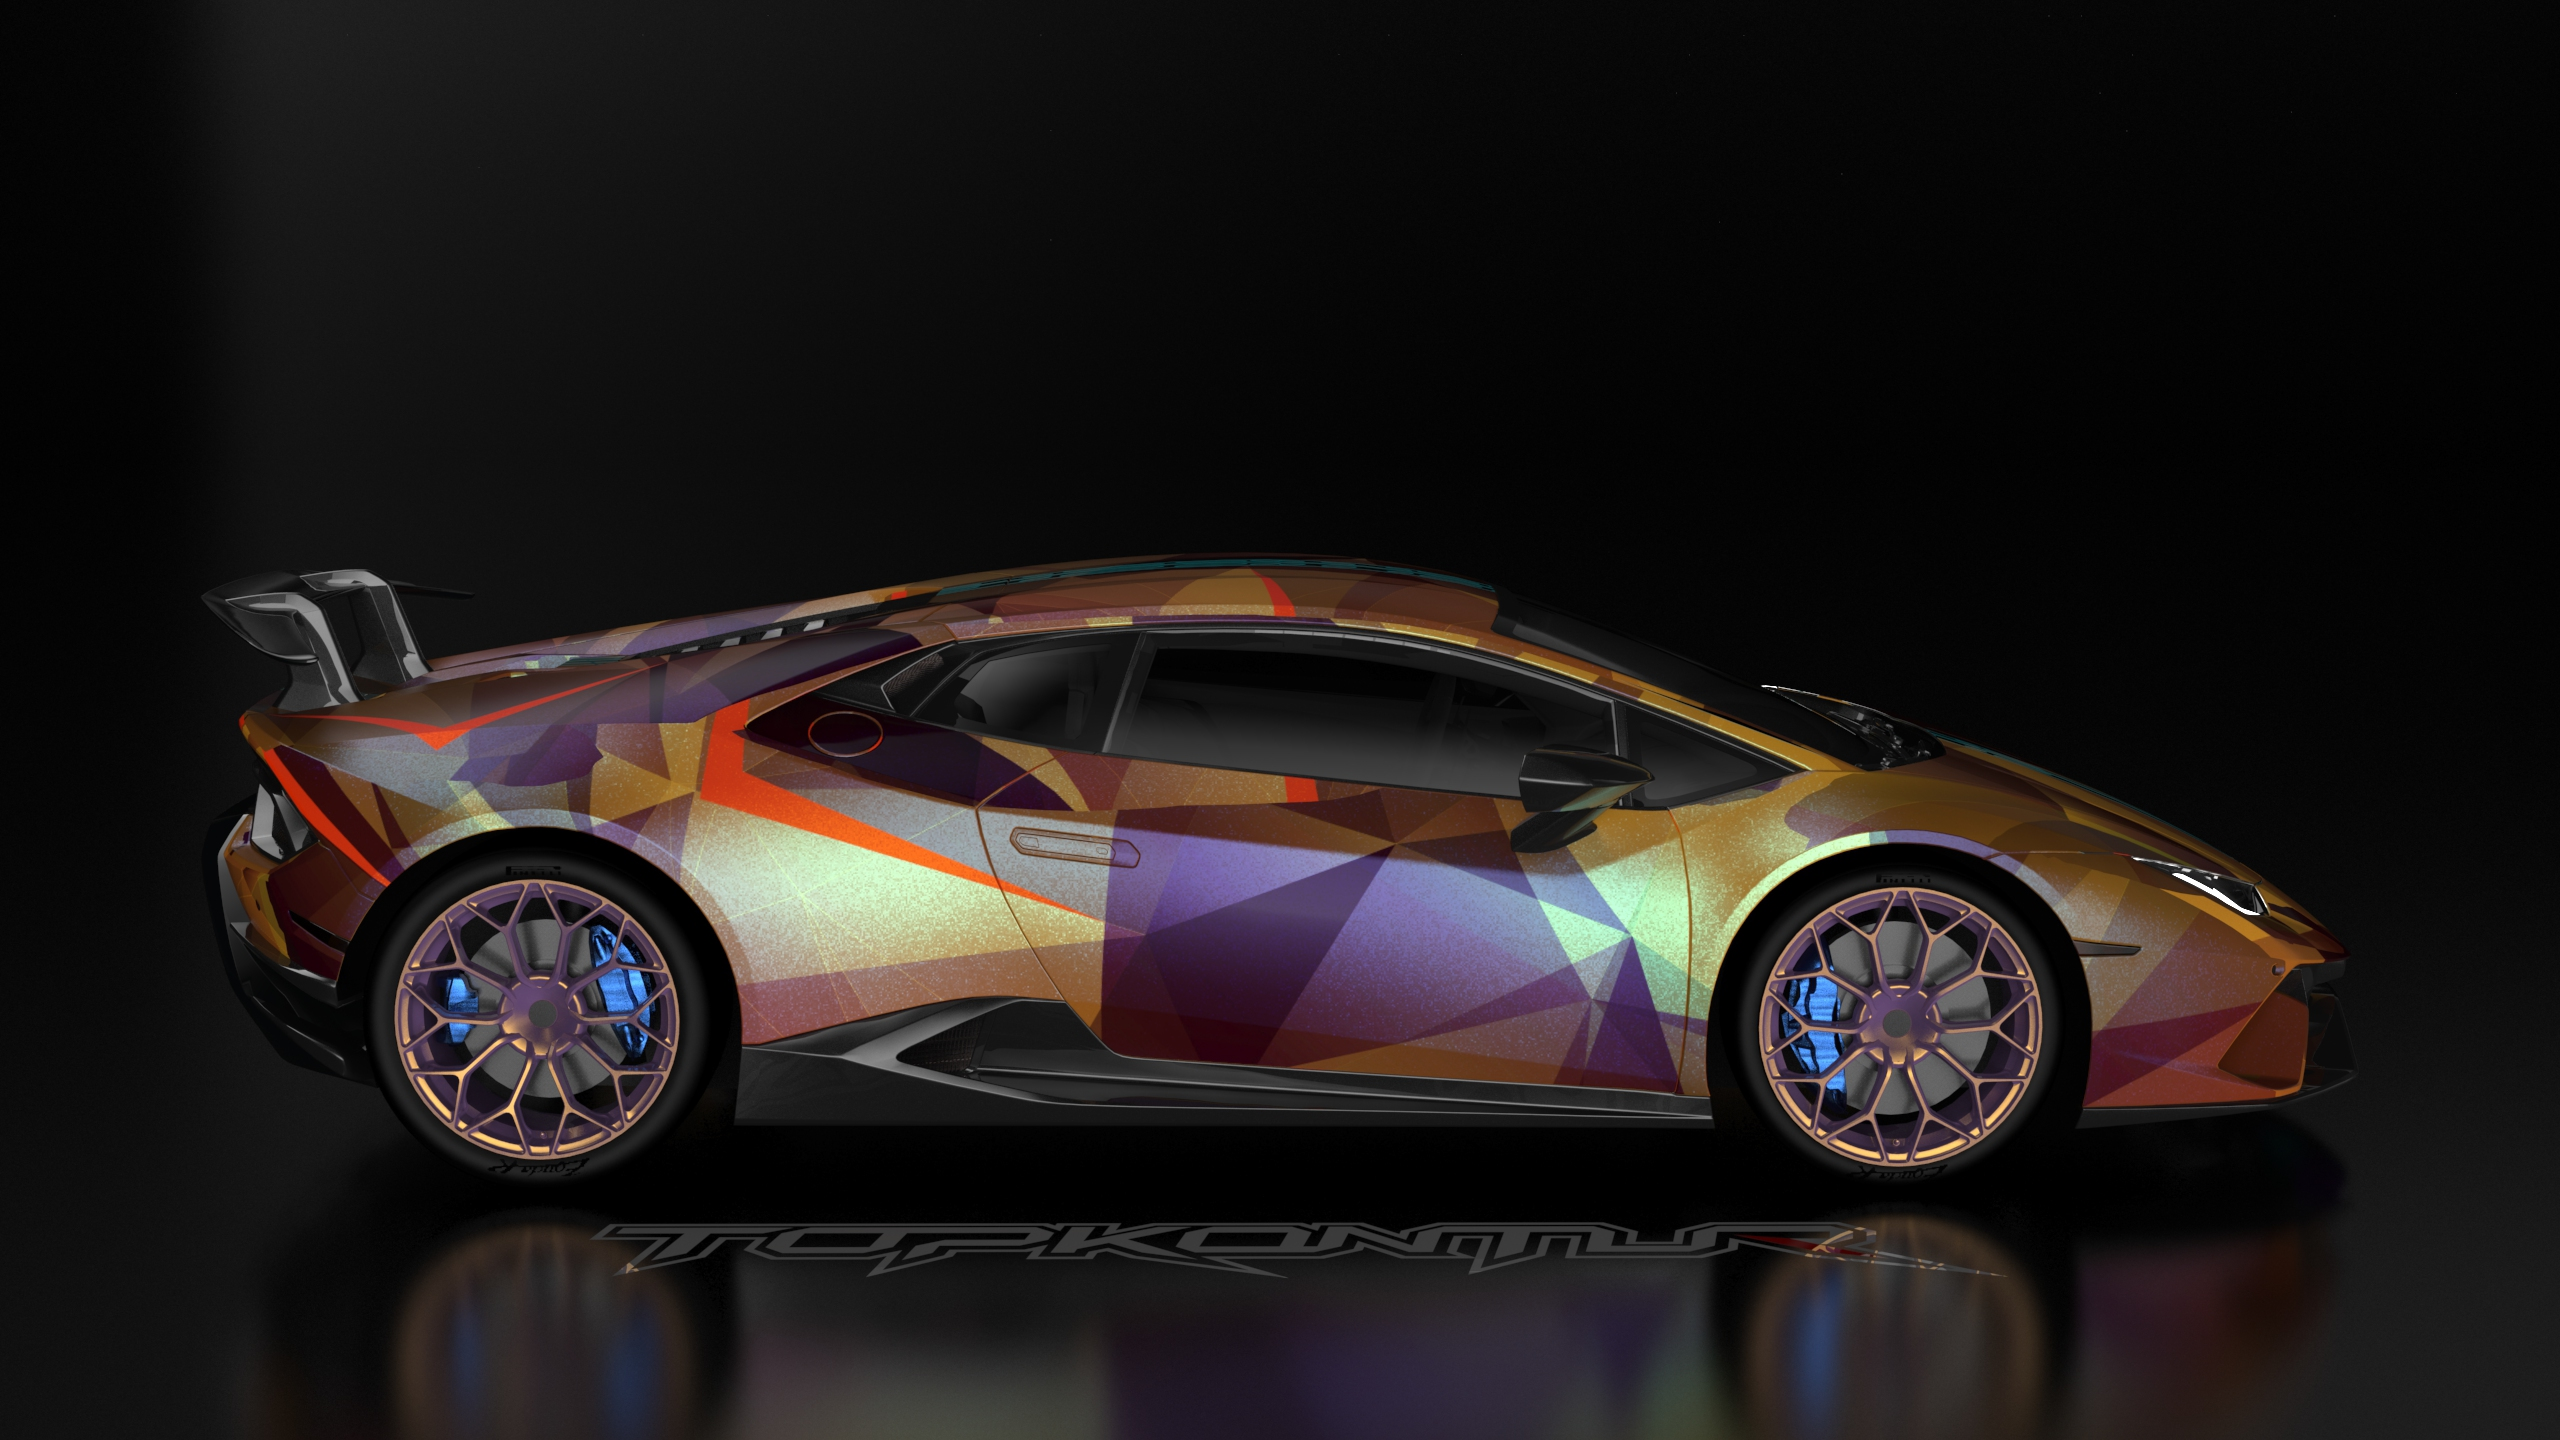 Gold And Wine Lamborghini Huracan Car Hd Cars 4k Wallpapers